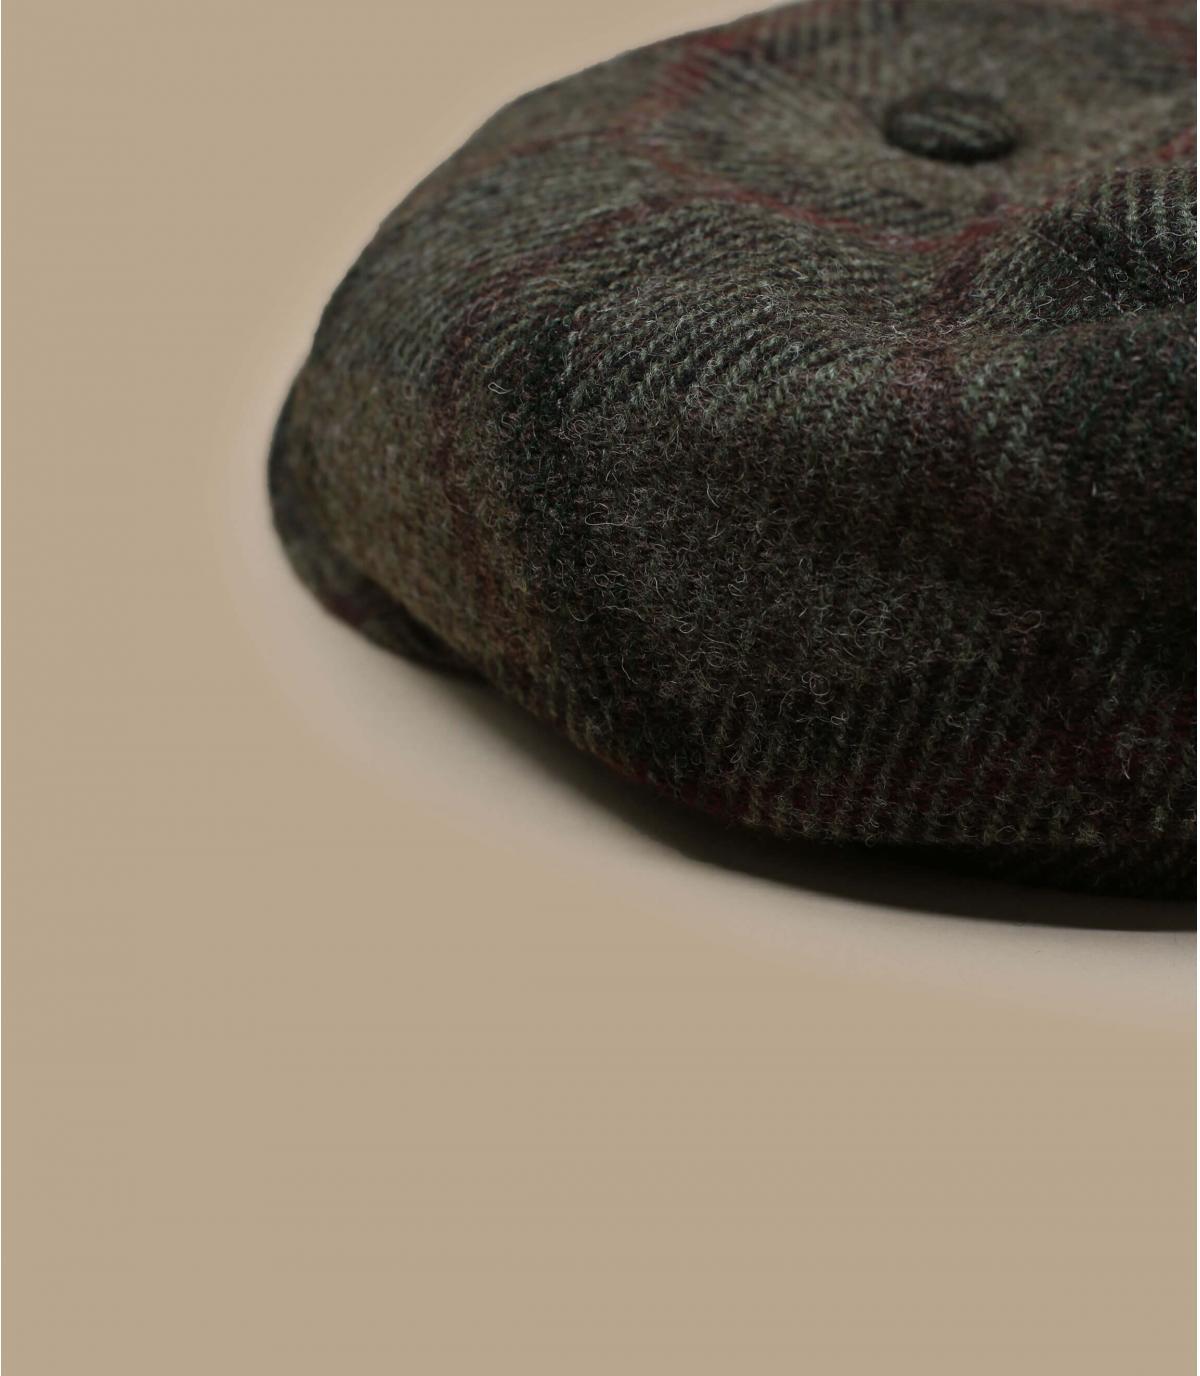 Dettagli Hatteras Virgin Wool check beige olive - image 2